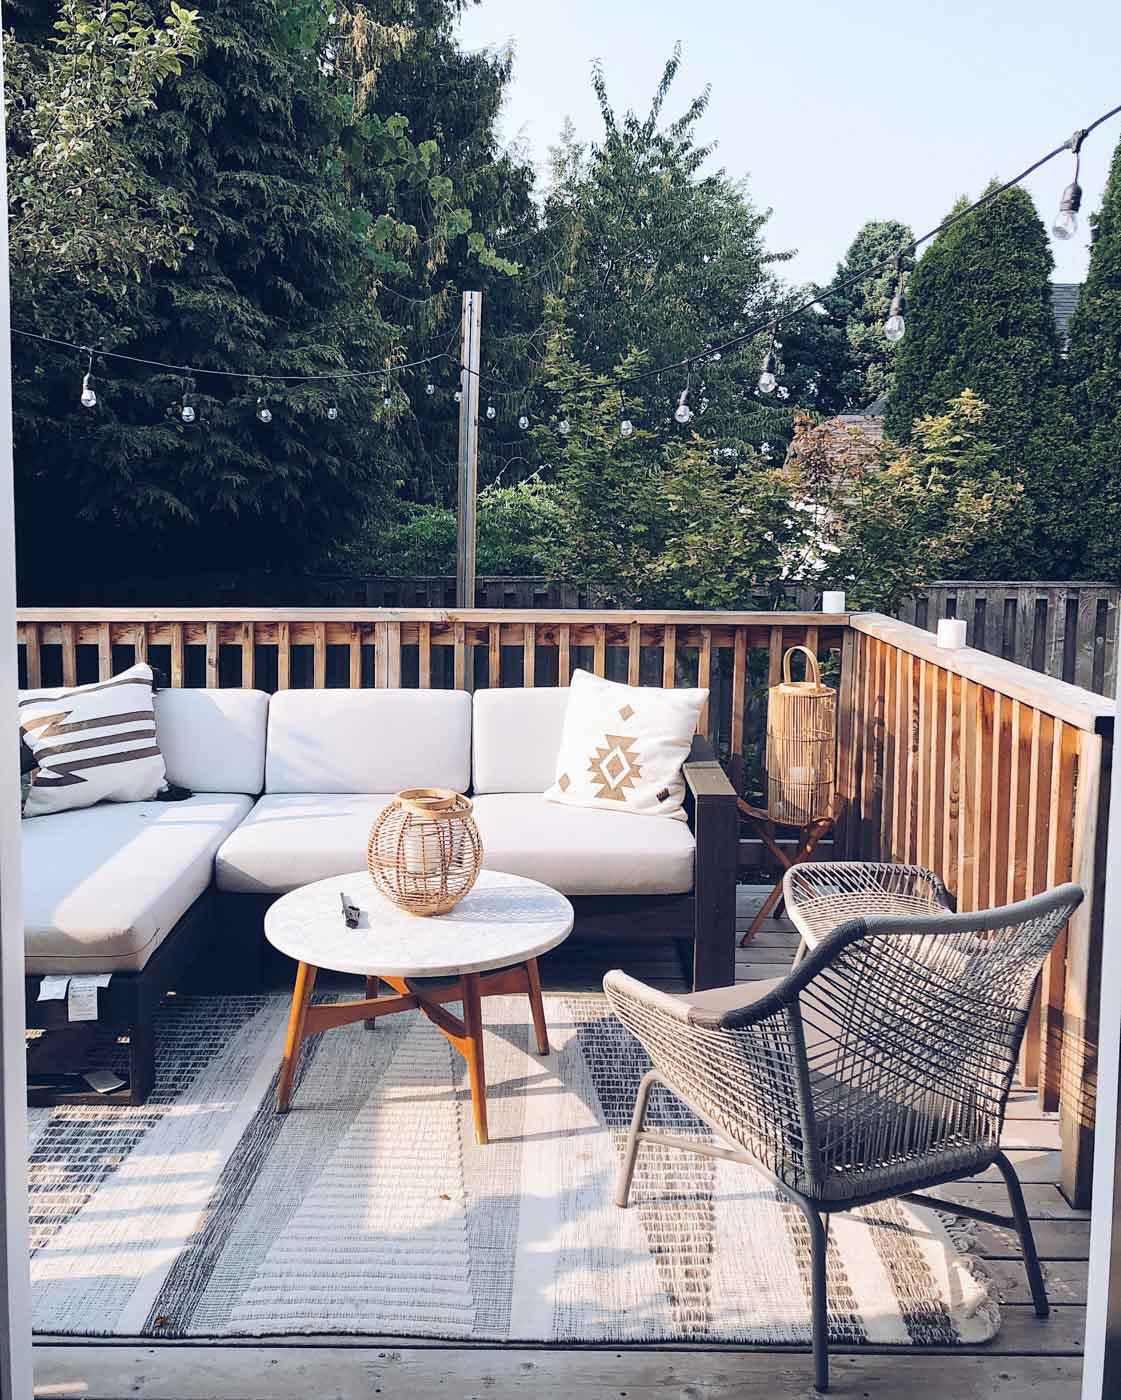 IndieSpirit-PortlandOR-natural-light-photography-studio-lifestyle-photoshoot-location-editorial-commercial-photography-1.jpg